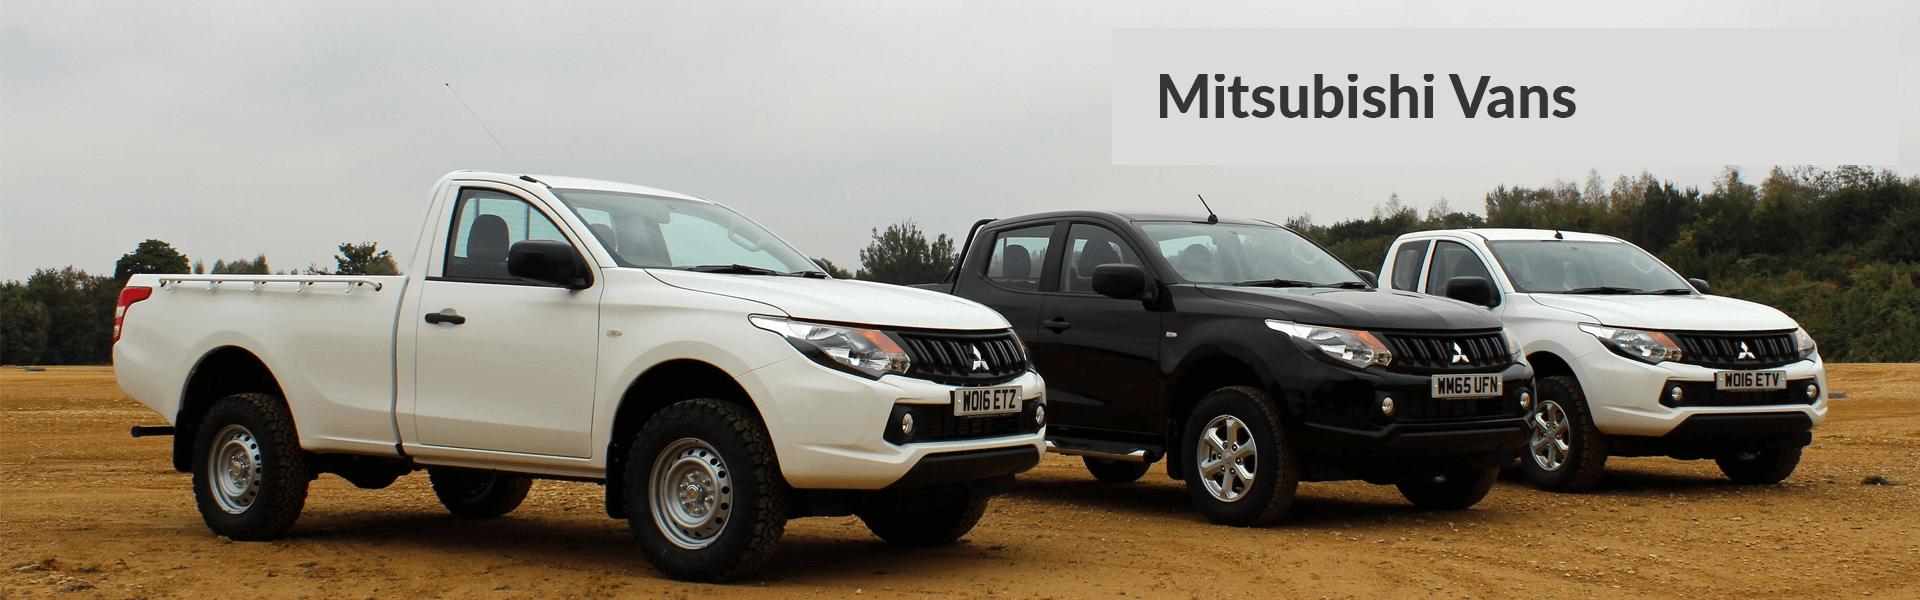 Mitsubishi Vans